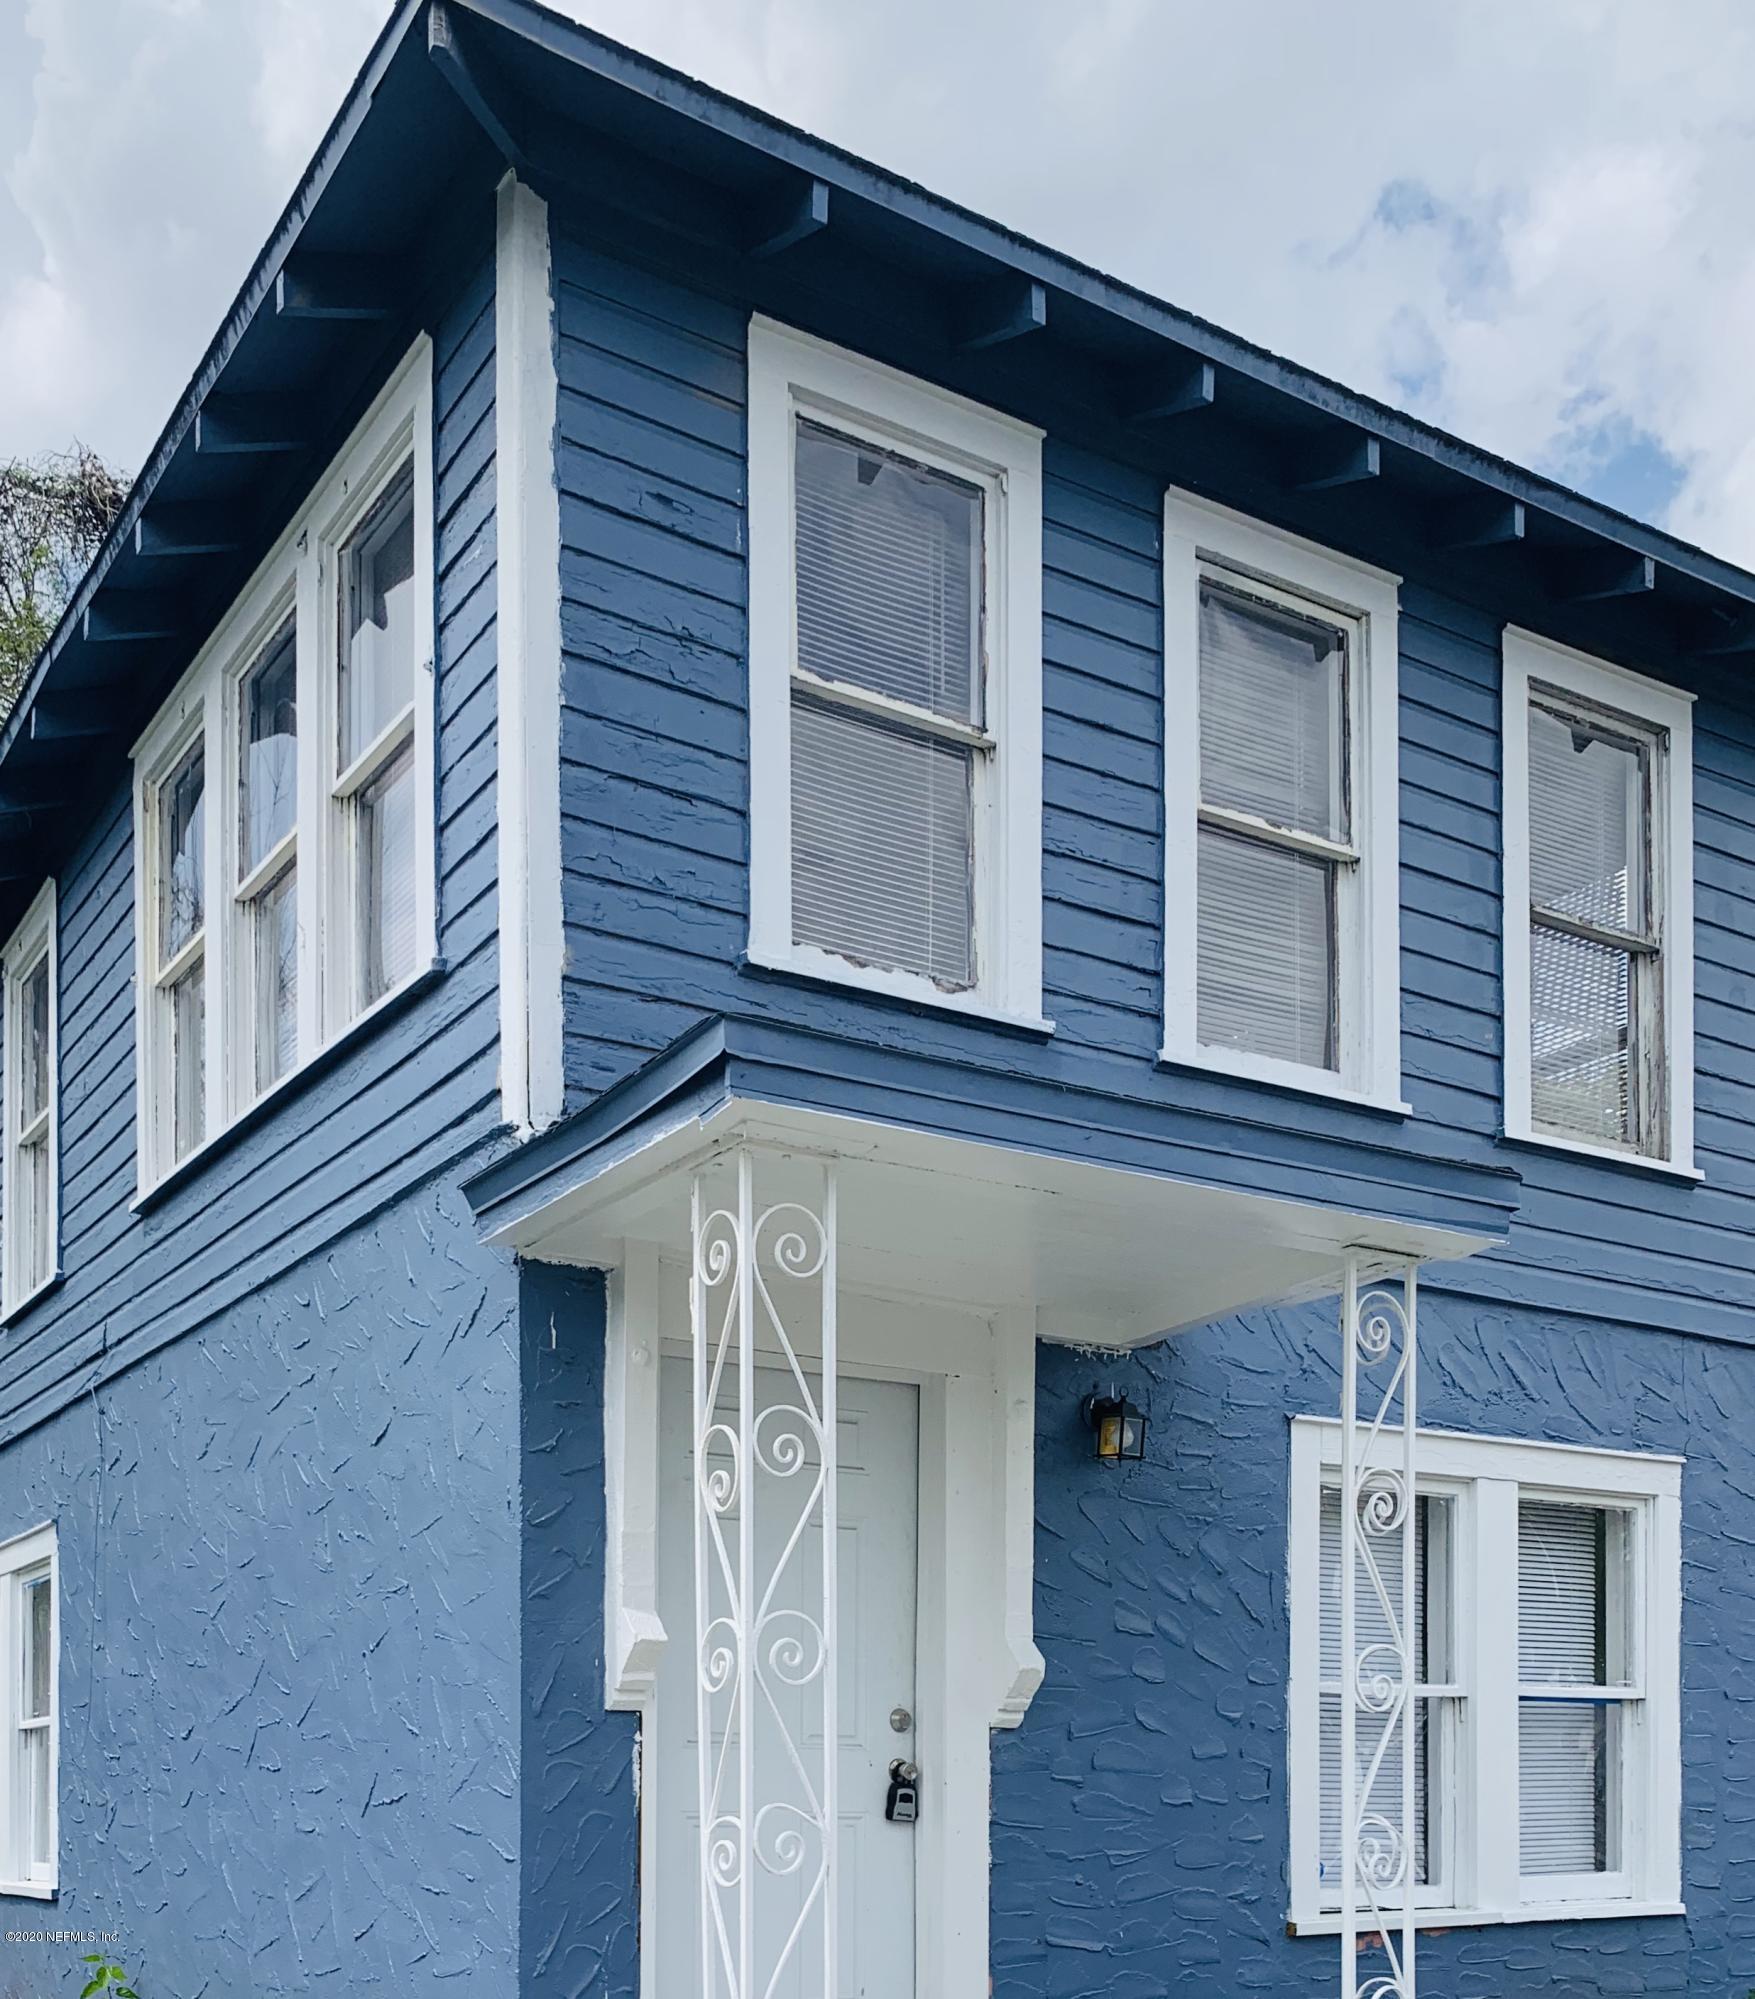 910 TYLER, JACKSONVILLE, FLORIDA 32209, 2 Bedrooms Bedrooms, ,1 BathroomBathrooms,Residential,For sale,TYLER,1080834